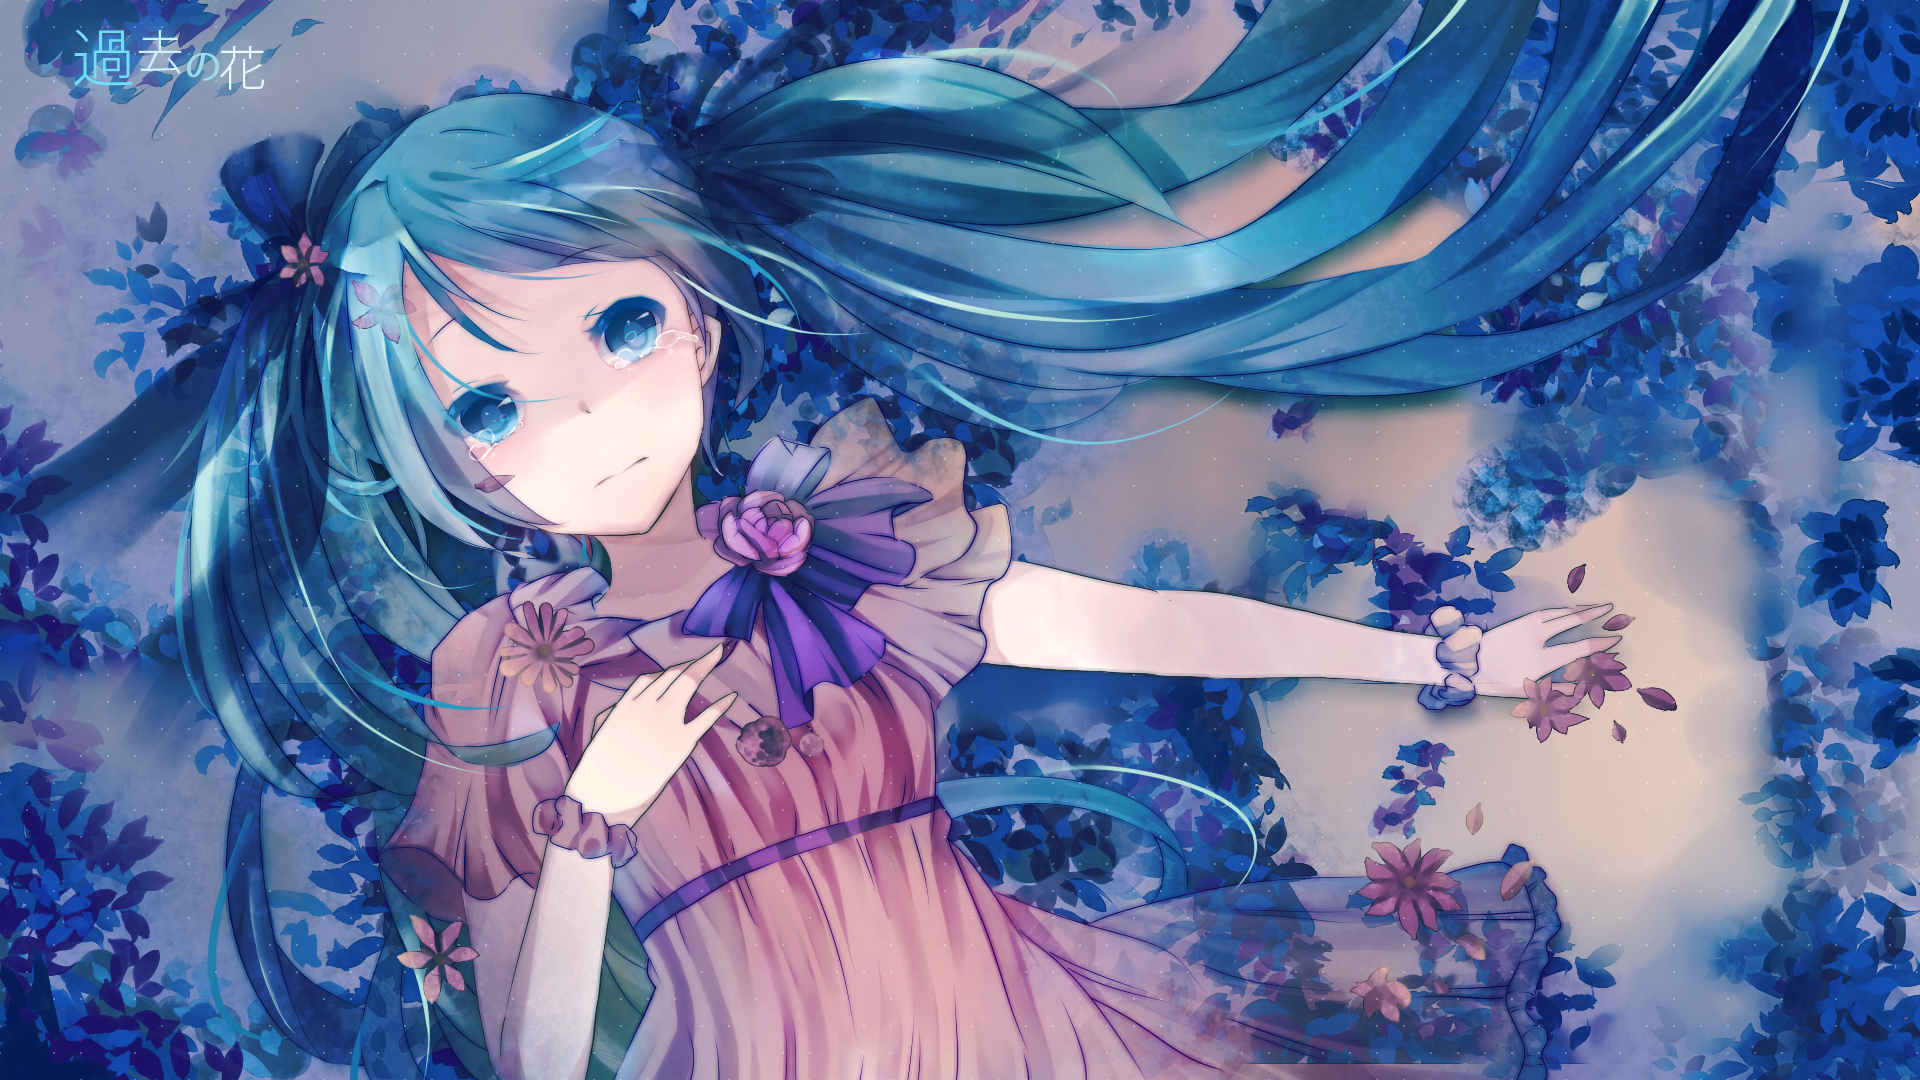 5500 Wallpaper Hp Hatsune Miku Hd Gratis